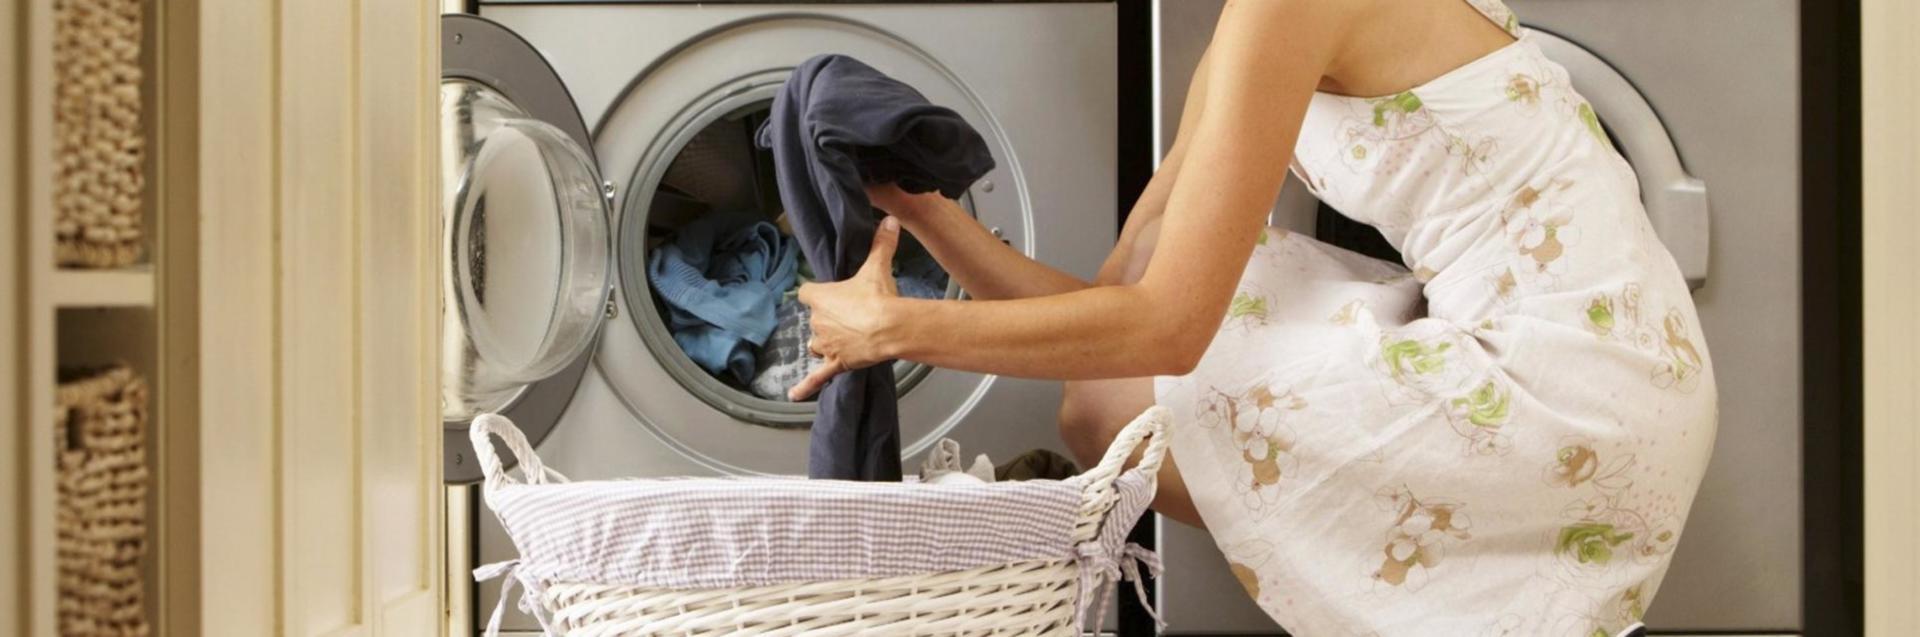 Servicio técnico lavadoras aspes